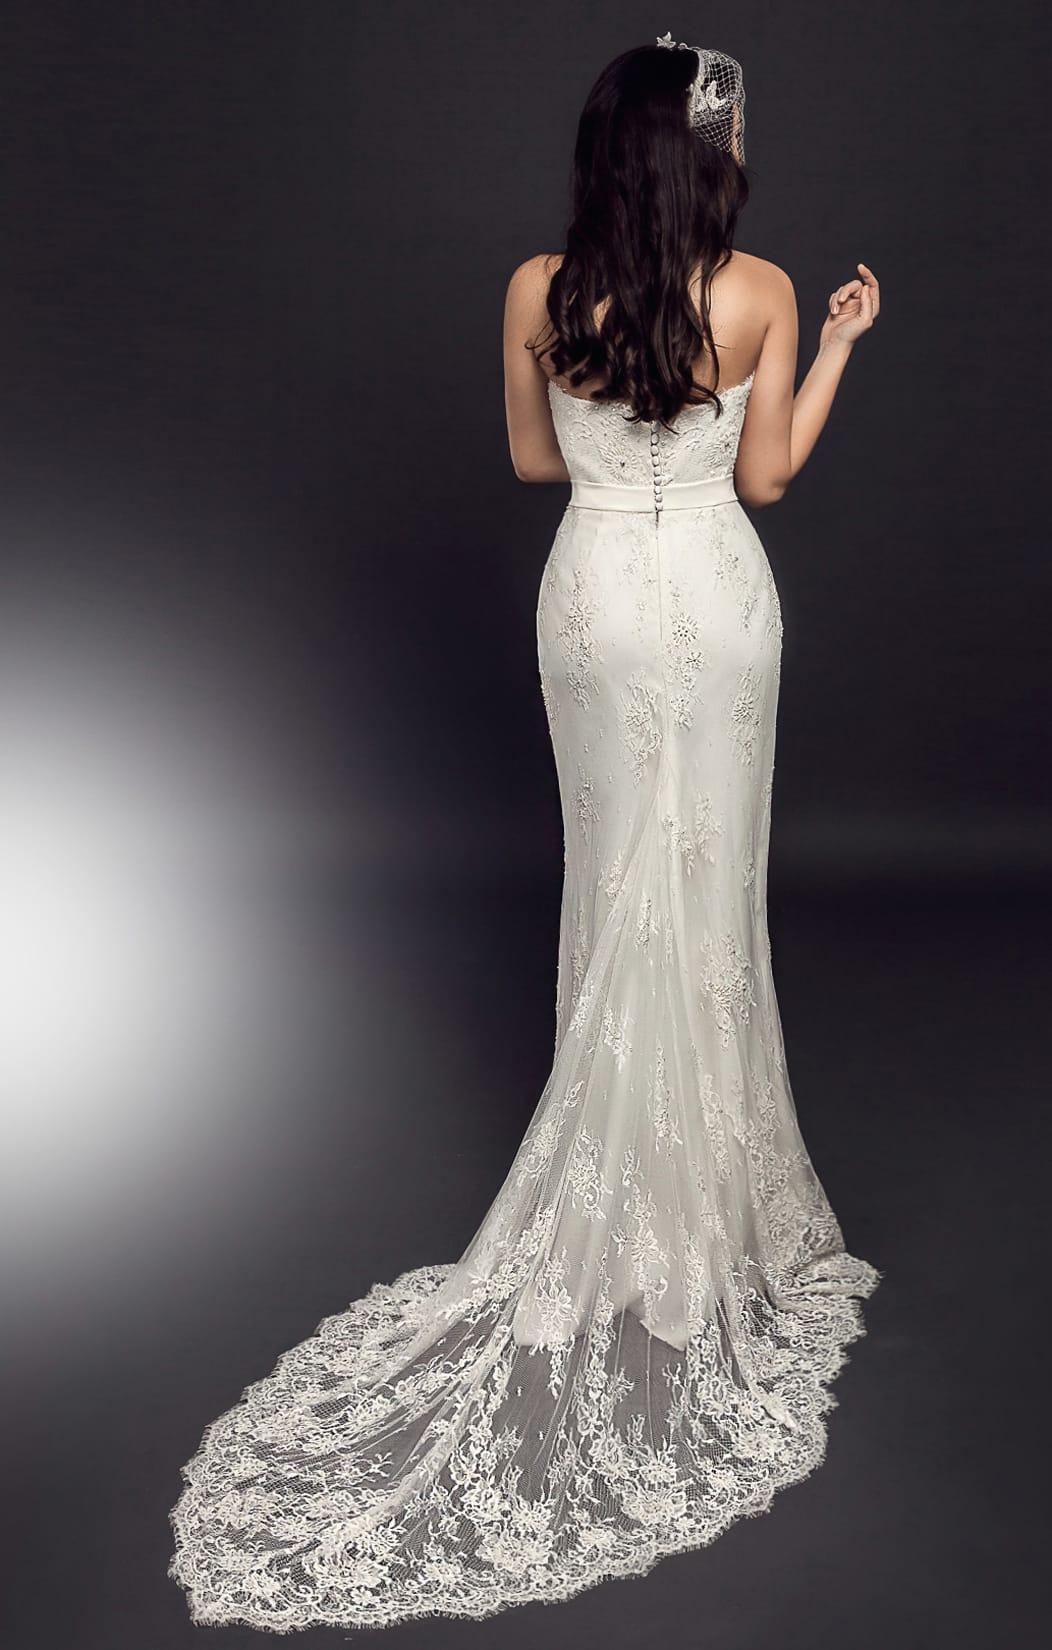 Persis Model - Colectia Dreams - Adora Sposa (2)